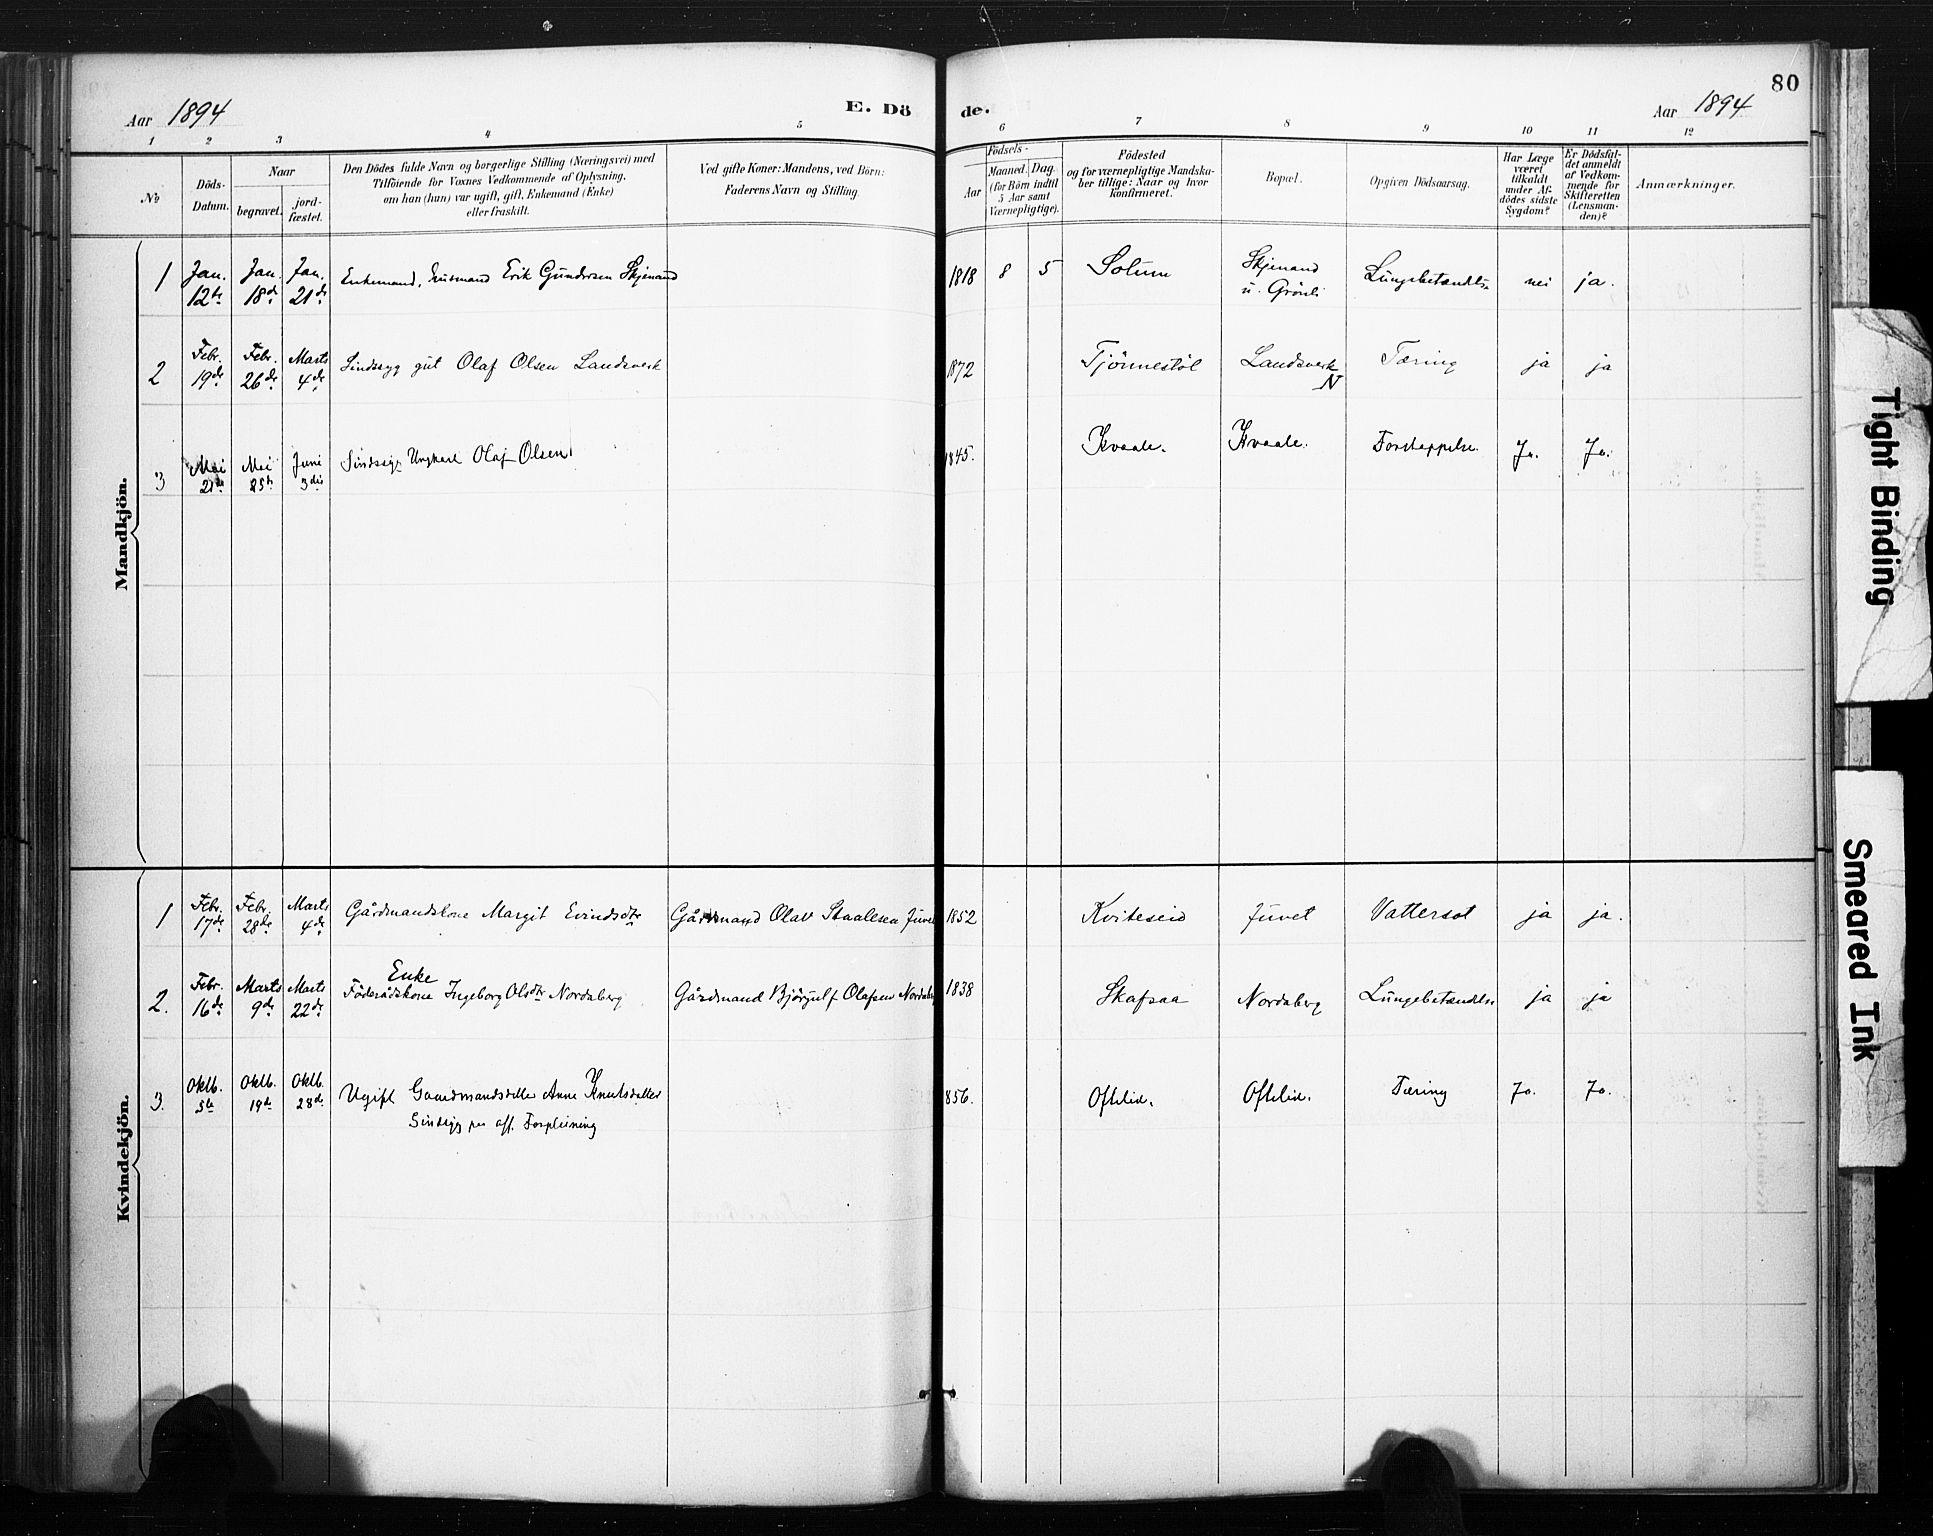 SAKO, Lårdal kirkebøker, F/Fc/L0002: Ministerialbok nr. III 2, 1887-1906, s. 80